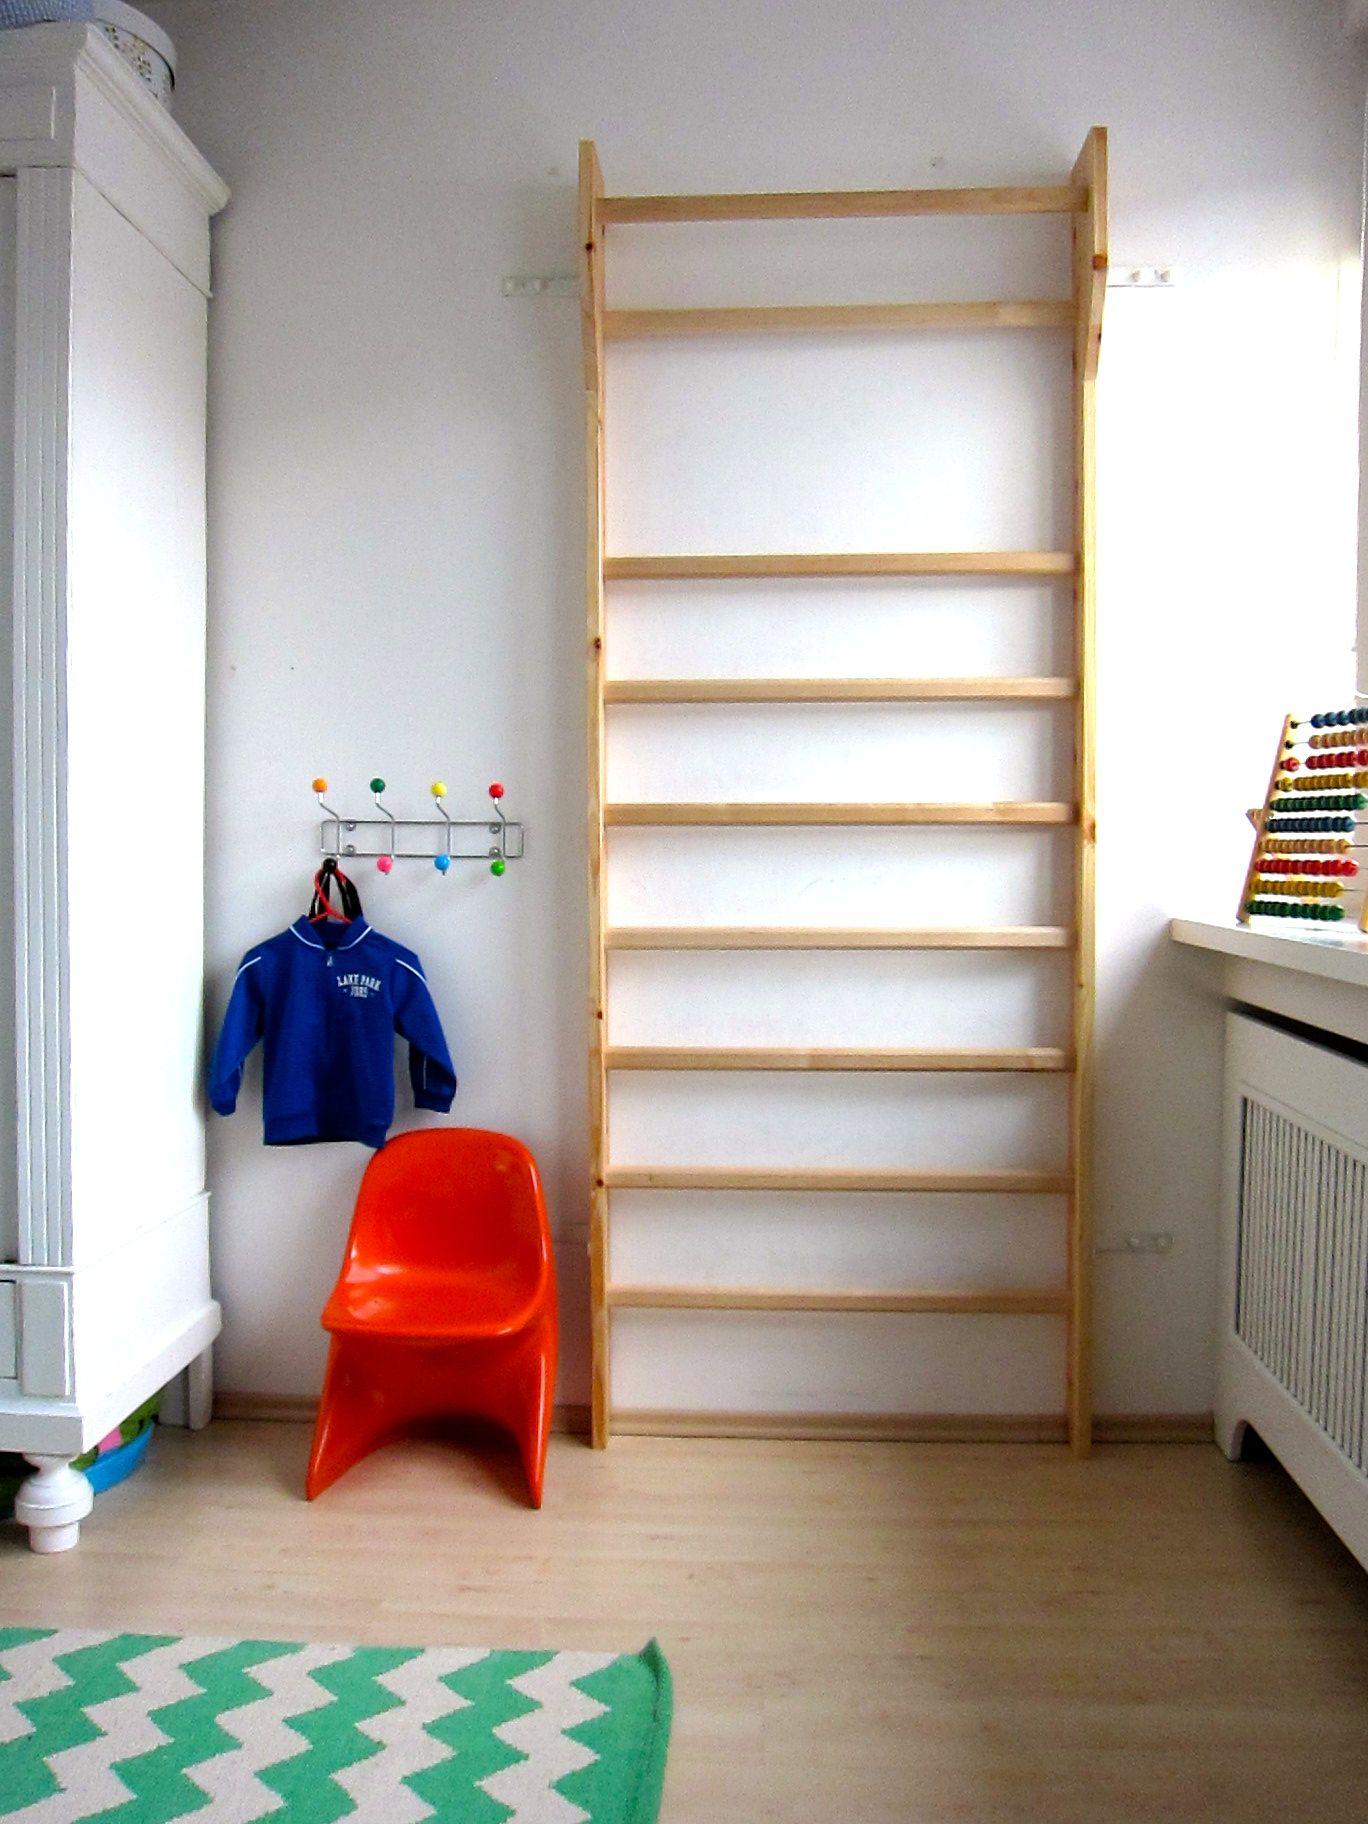 Full Size of Sprossenwand Kinderzimmer Kletterwand Sofa Regale Regal Weiß Kinderzimmer Sprossenwand Kinderzimmer